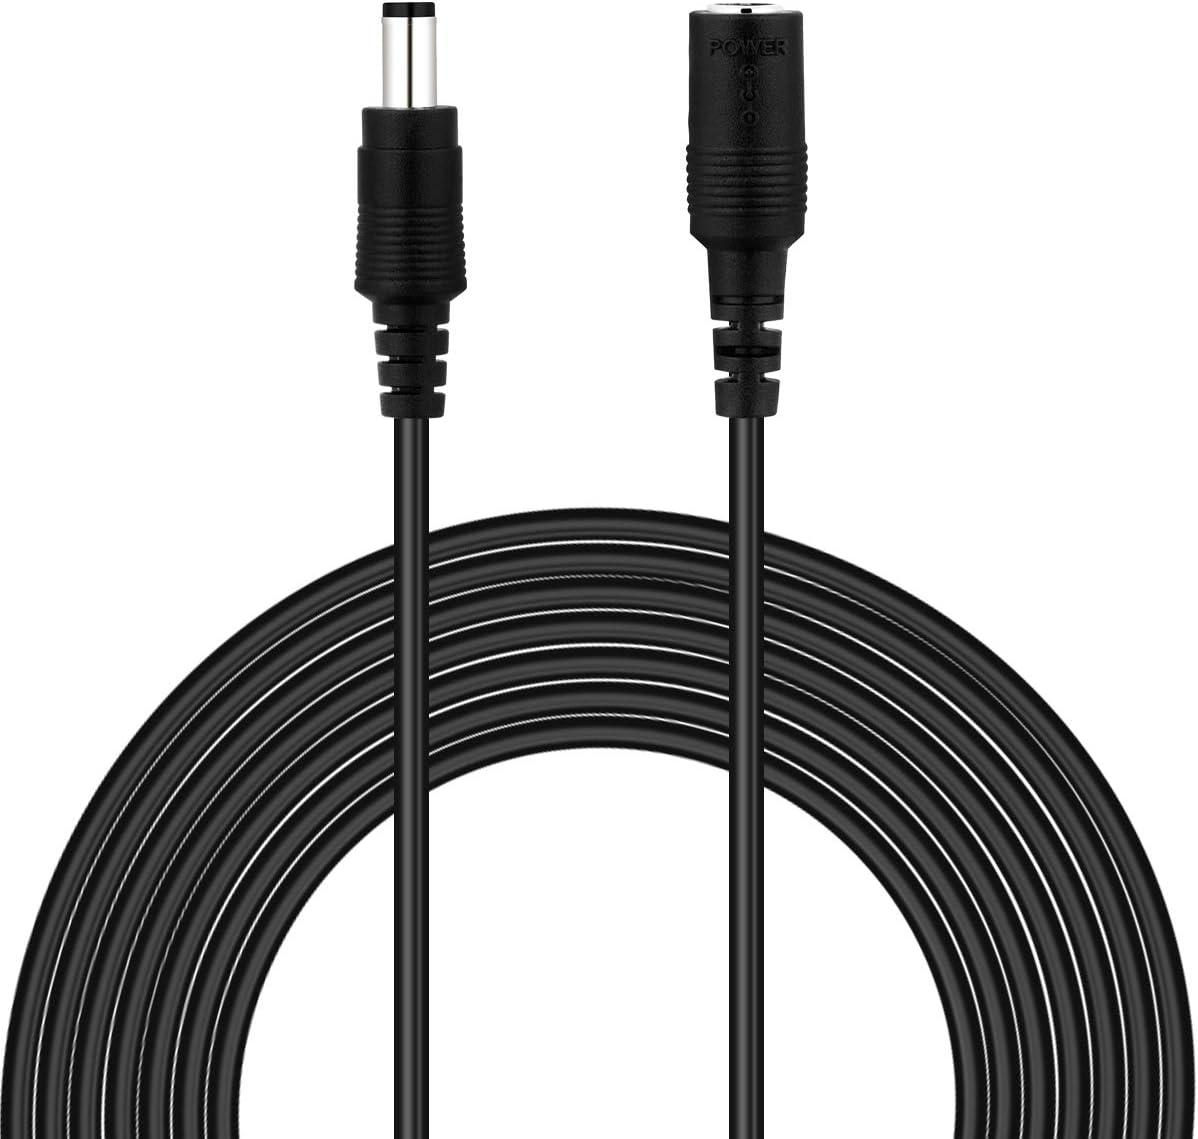 Dericam Cable de extensión de cargador de pared para adaptador de corriente de 6 metros, cable de extensión de CC de 12 voltios, tamaño de conector de 5.5x2.1 mm, 12V-6M, Negro